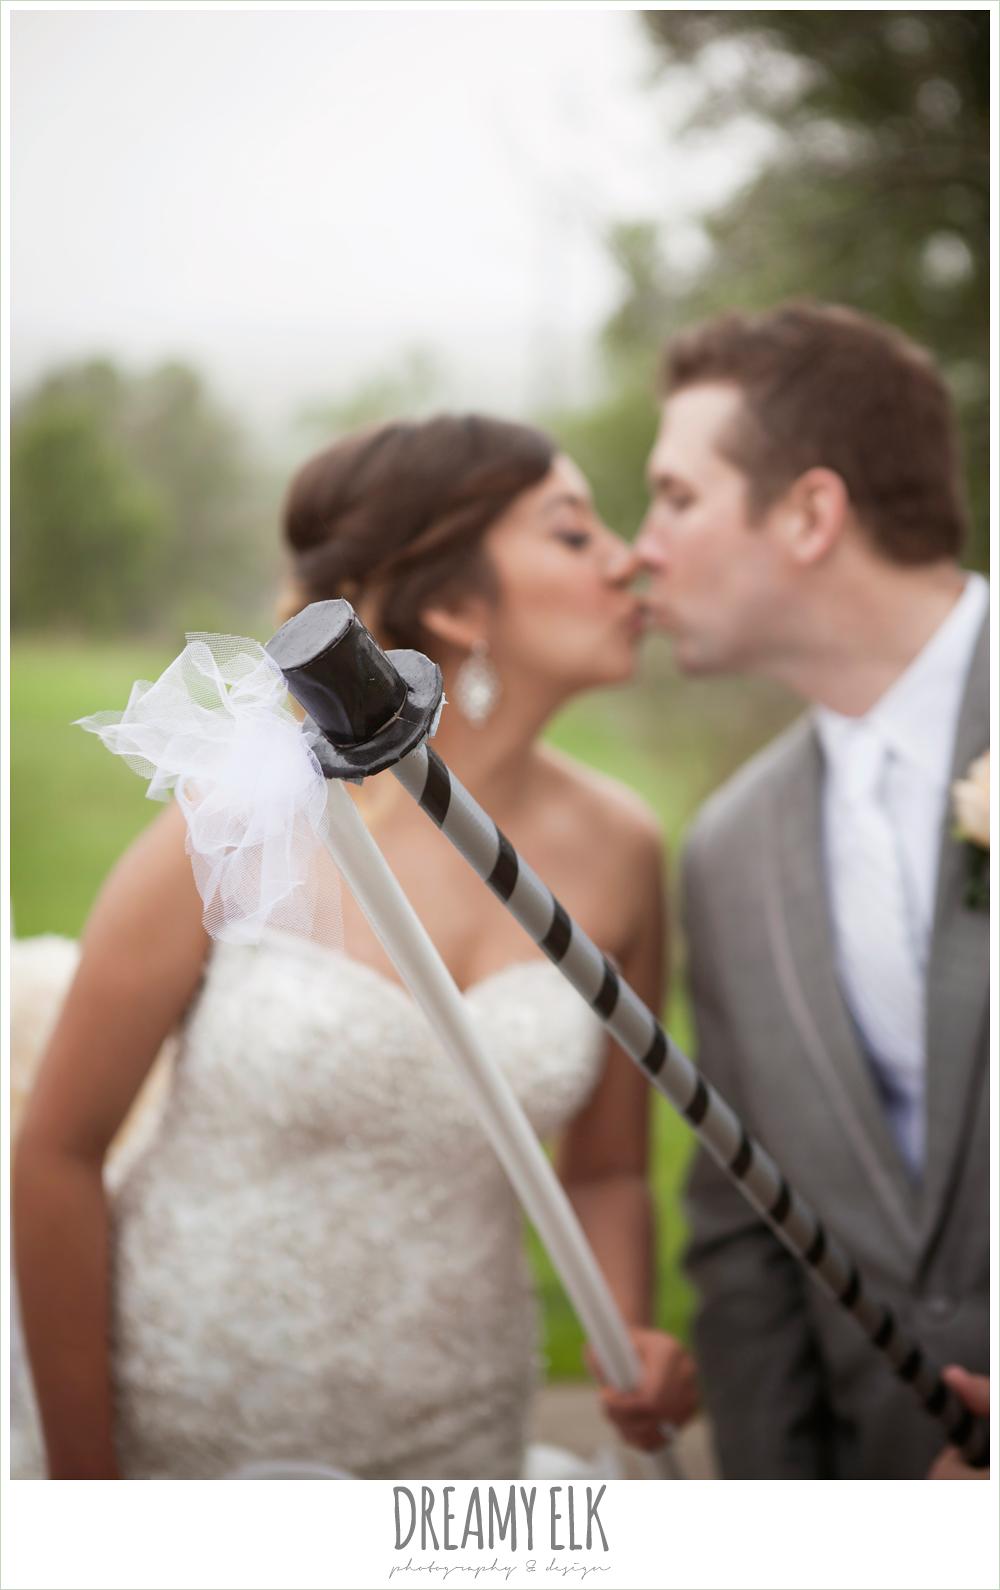 pinatas at wedding reception, bride and groom kissing, austin spring wedding {dreamy elk photography and design}